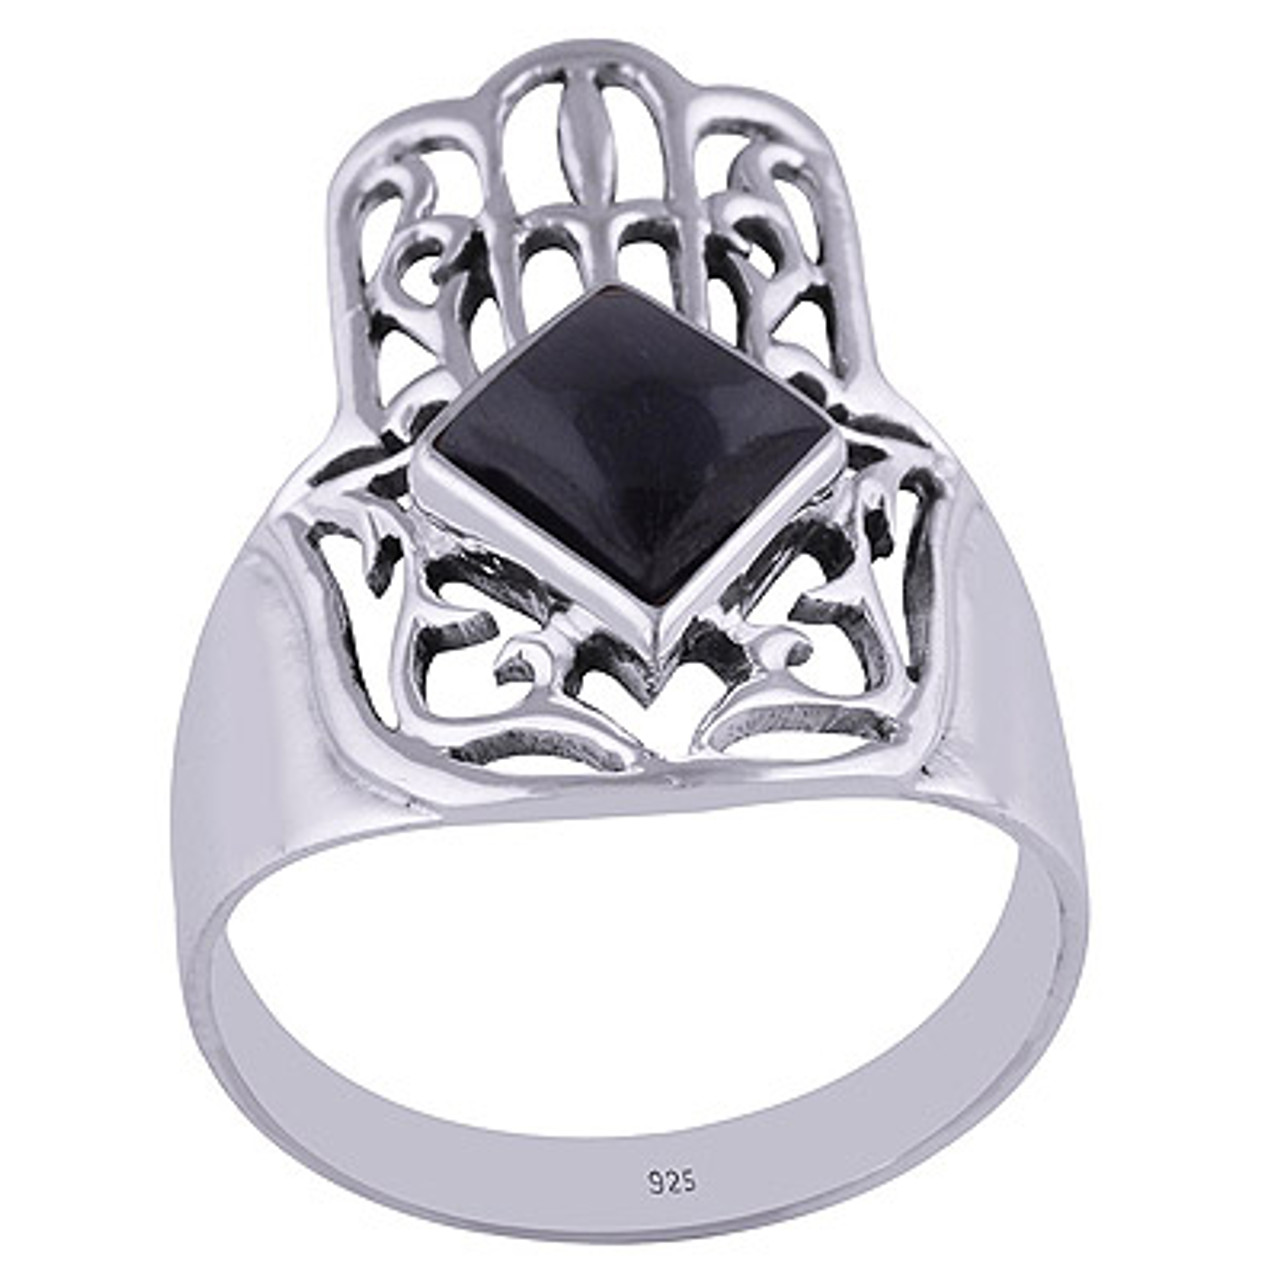 Healing Hands Rings